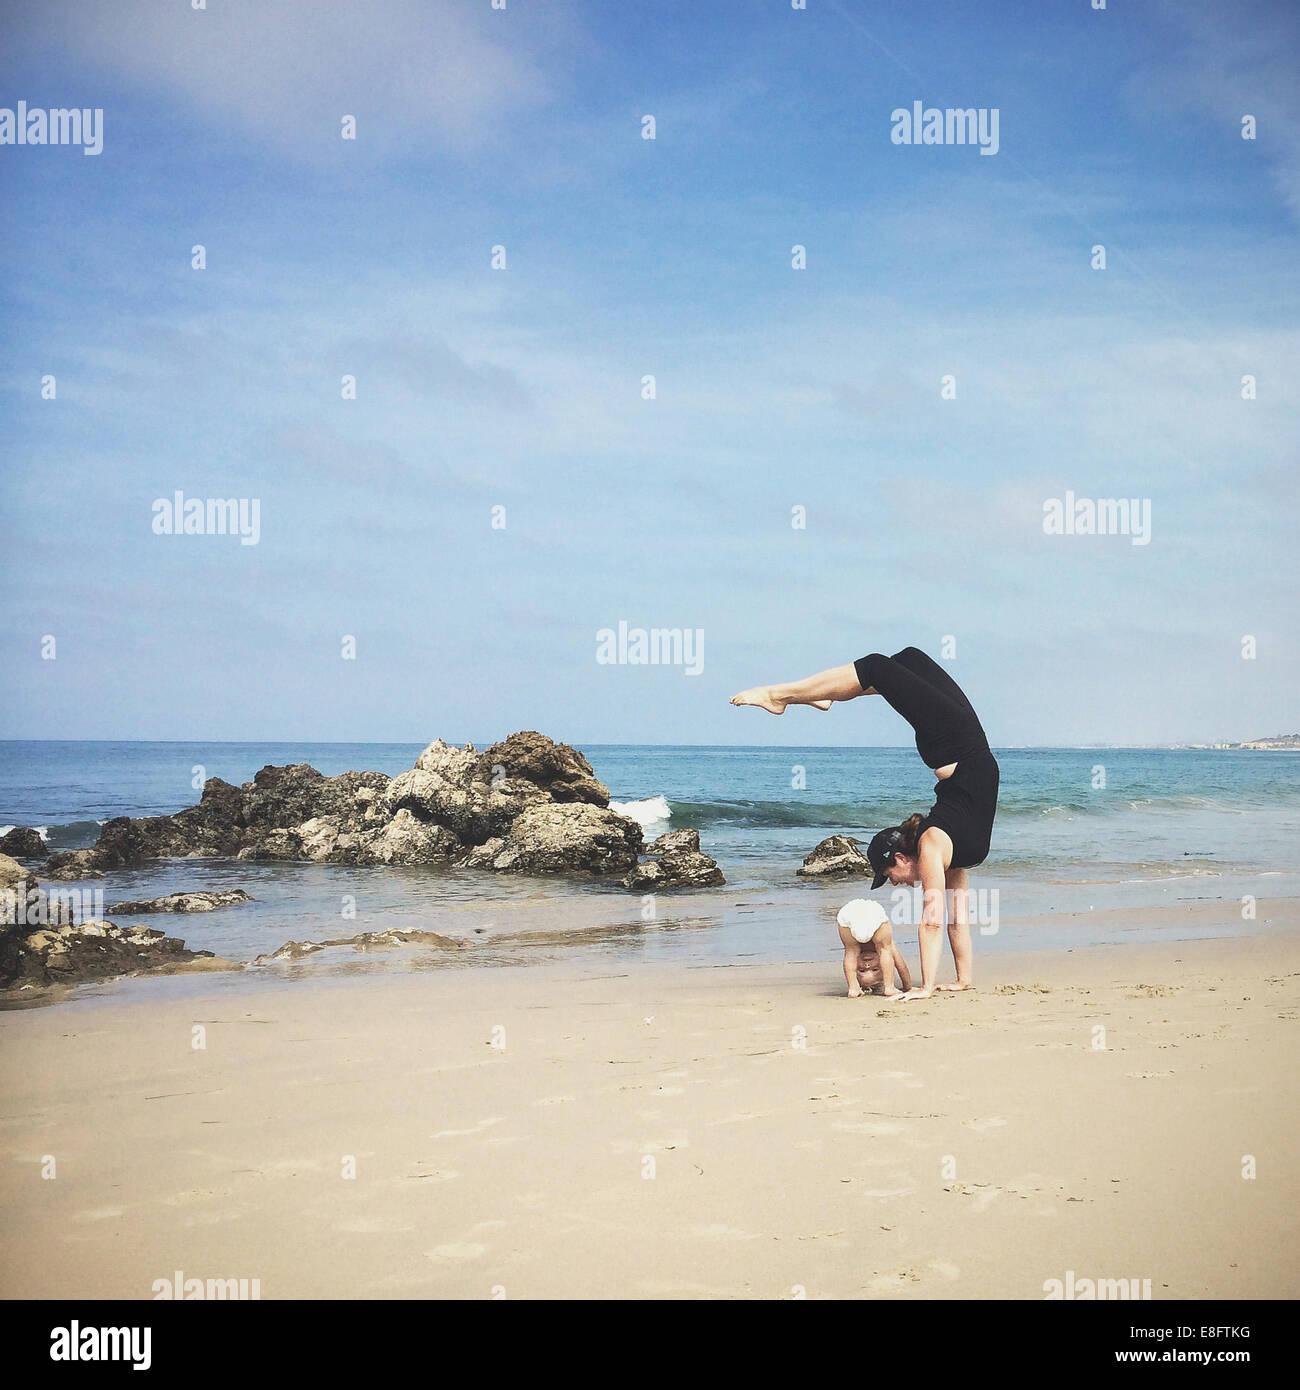 Mother and son doing yoga on beach, California, america, USA - Stock Image